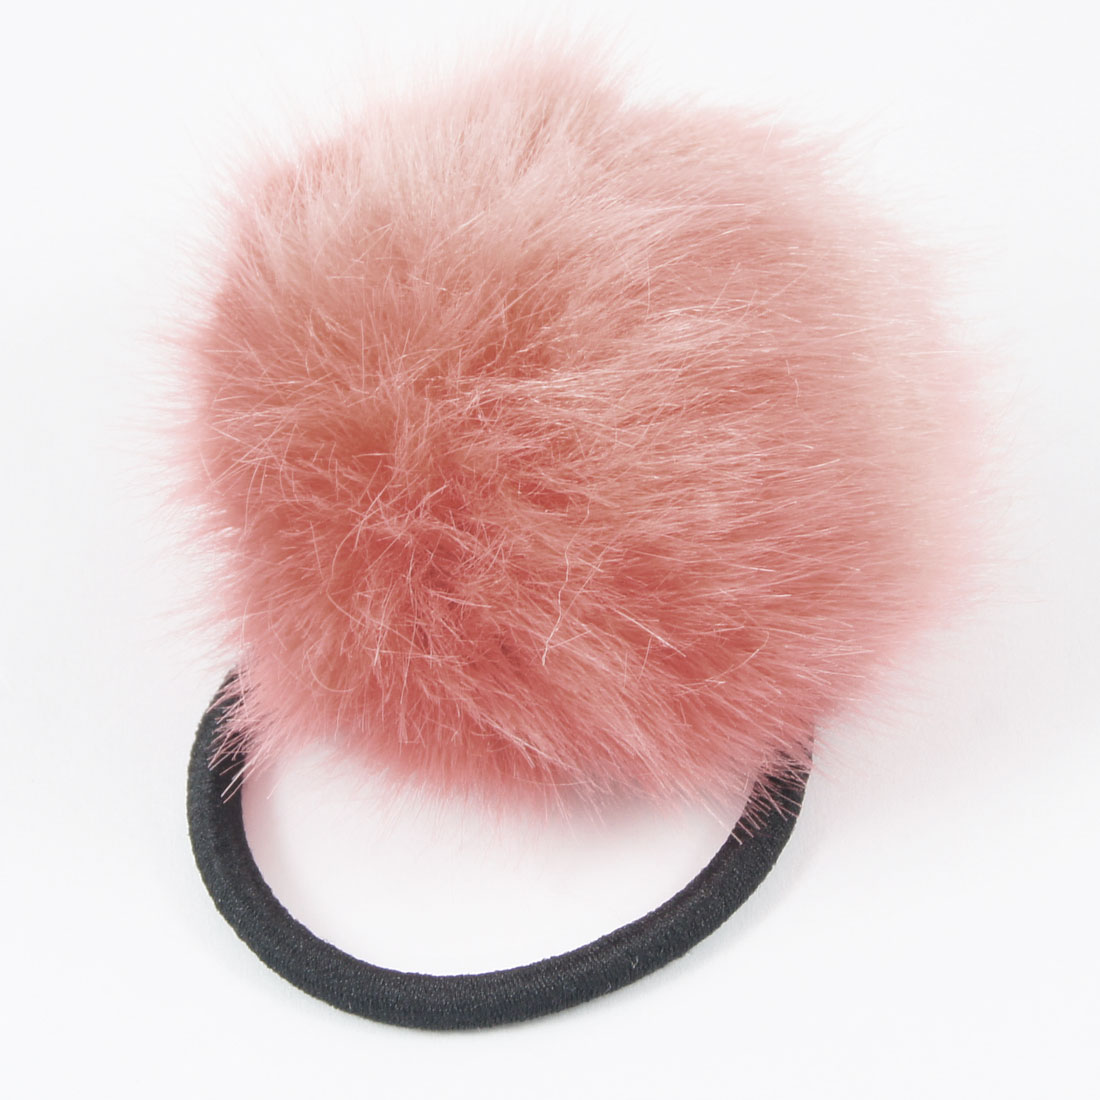 Women Elastic Band Peach Pink Plush Ball Detail Hair Tie Ponytail Holder